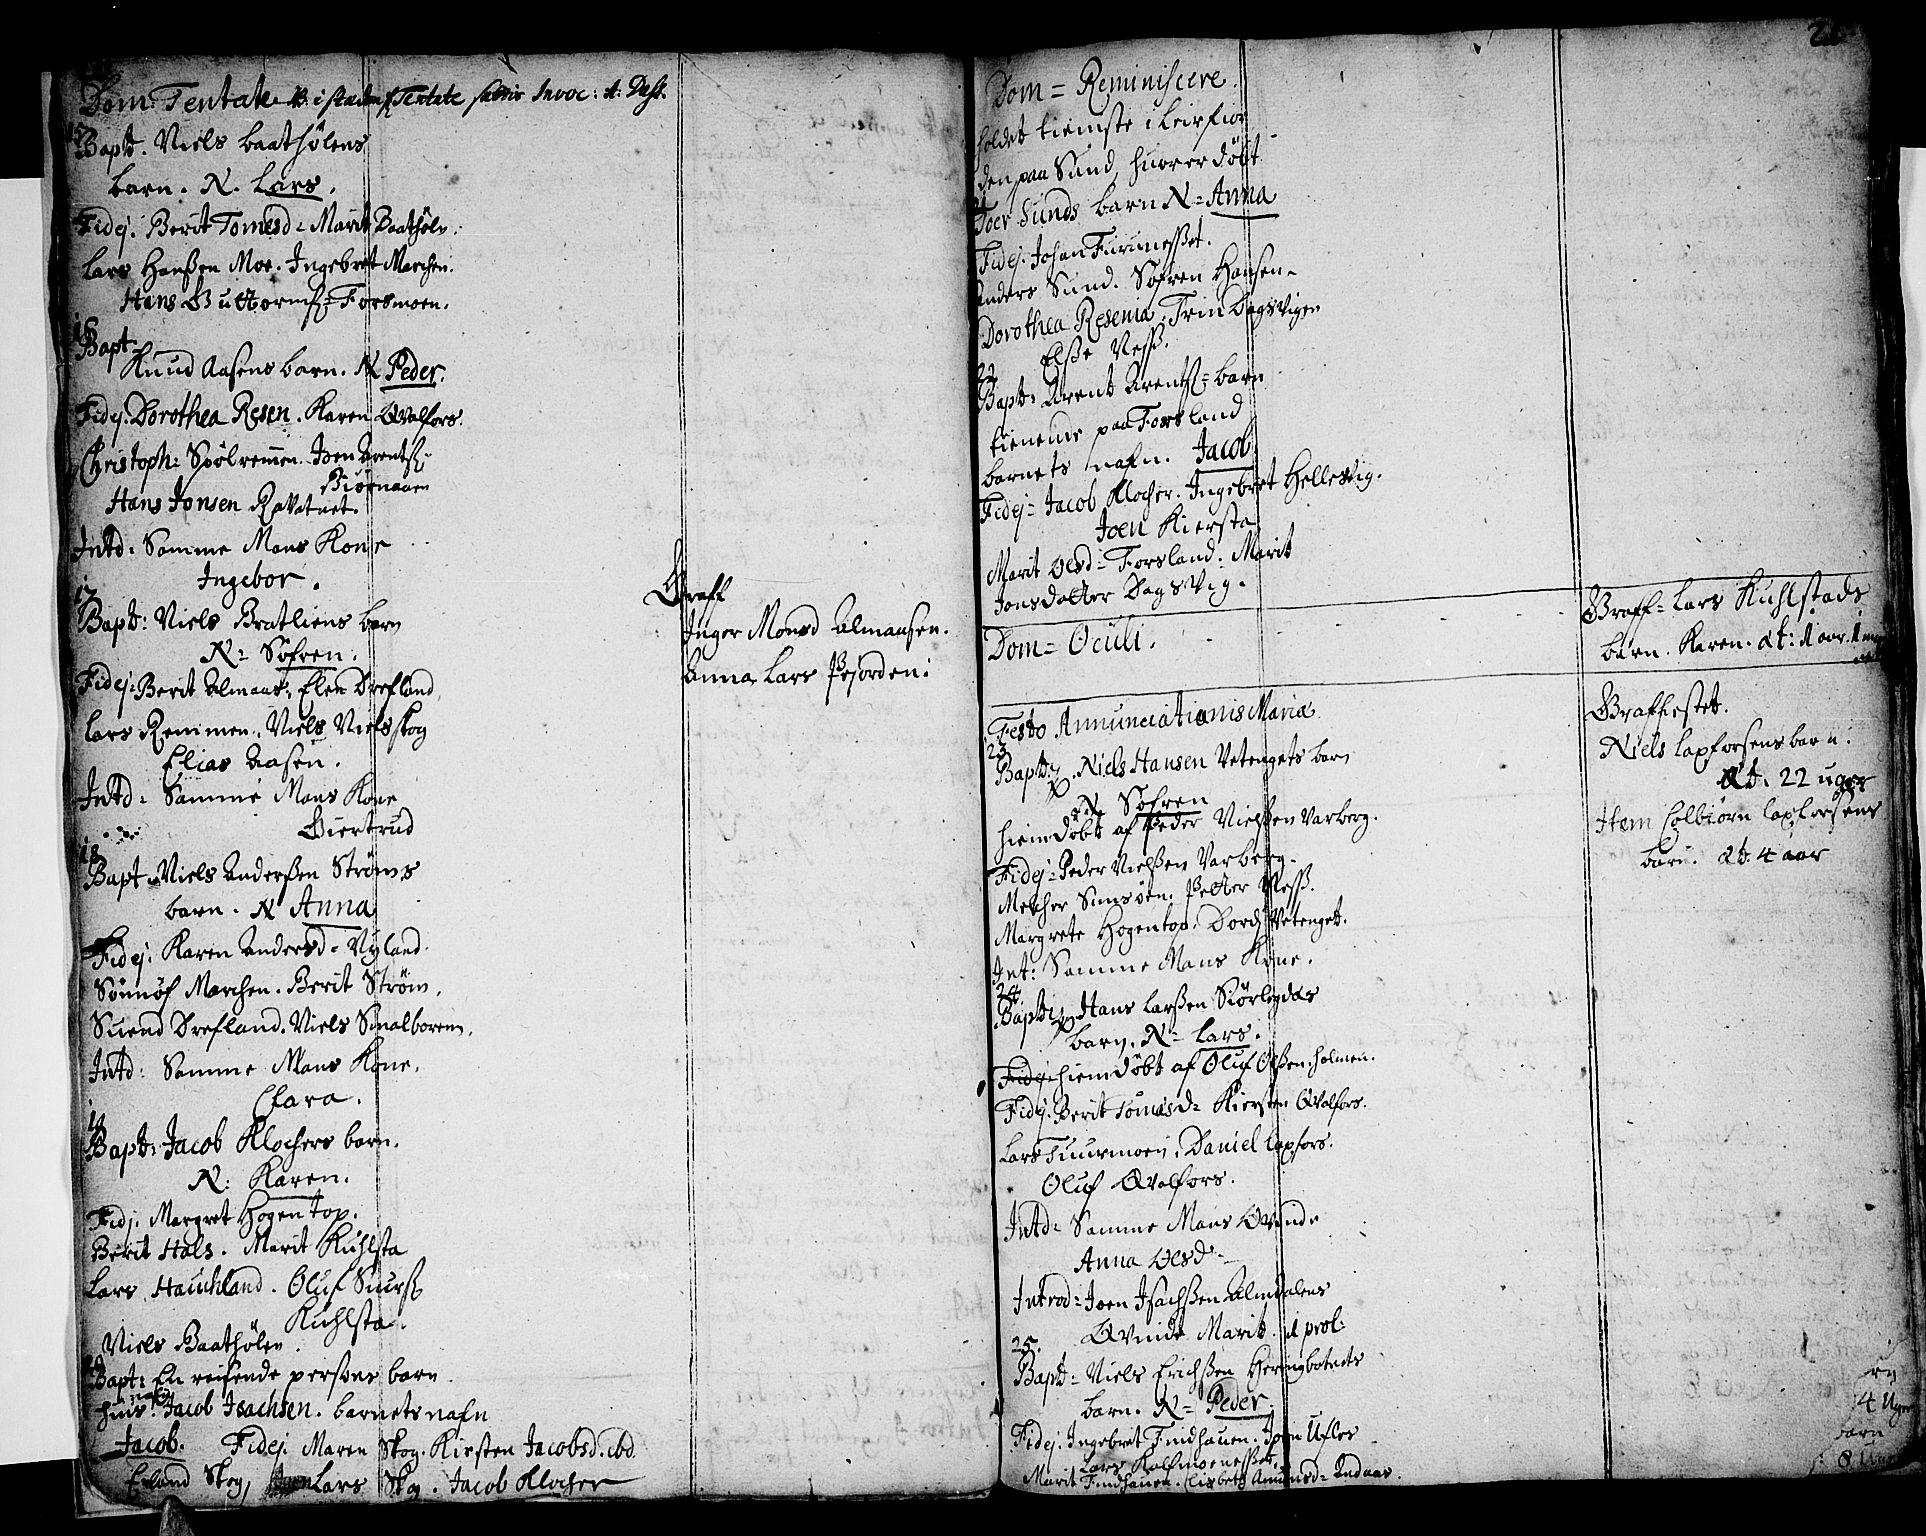 SAT, Ministerialprotokoller, klokkerbøker og fødselsregistre - Nordland, 820/L0281: Ministerialbok nr. 820A02, 1712-1720, s. 20-21